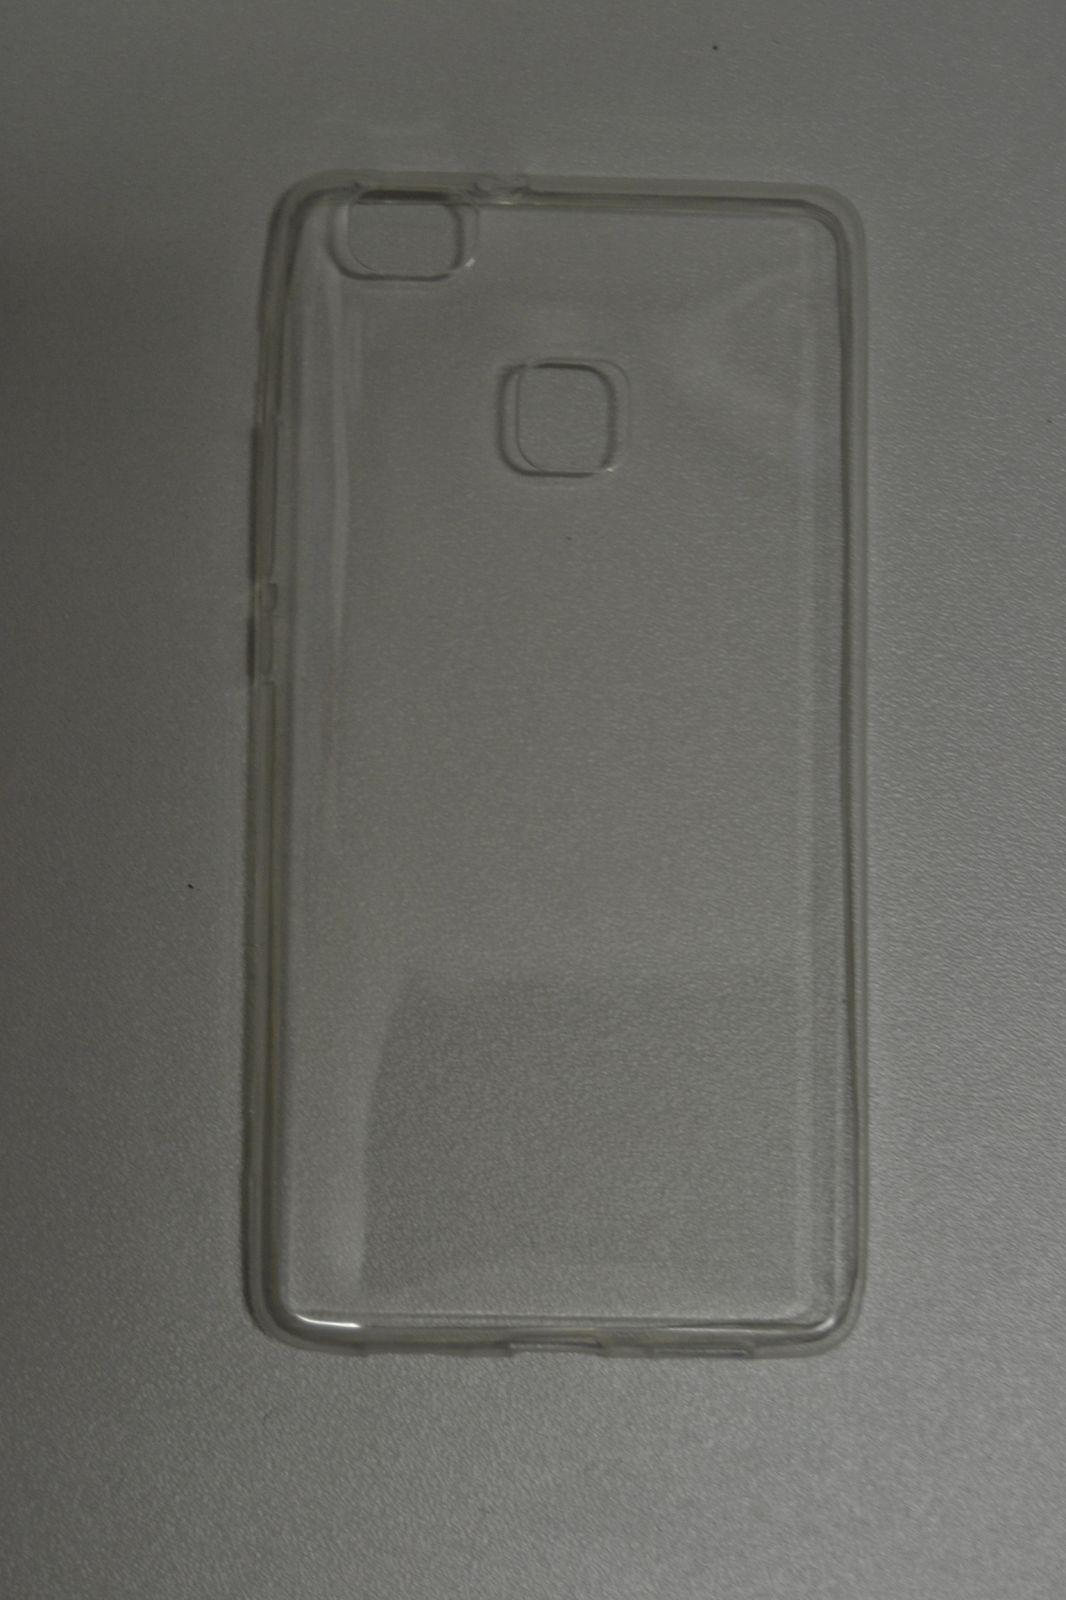 Silikonový kryt na mobilní telefon Huawei P9 lite, pouzdro